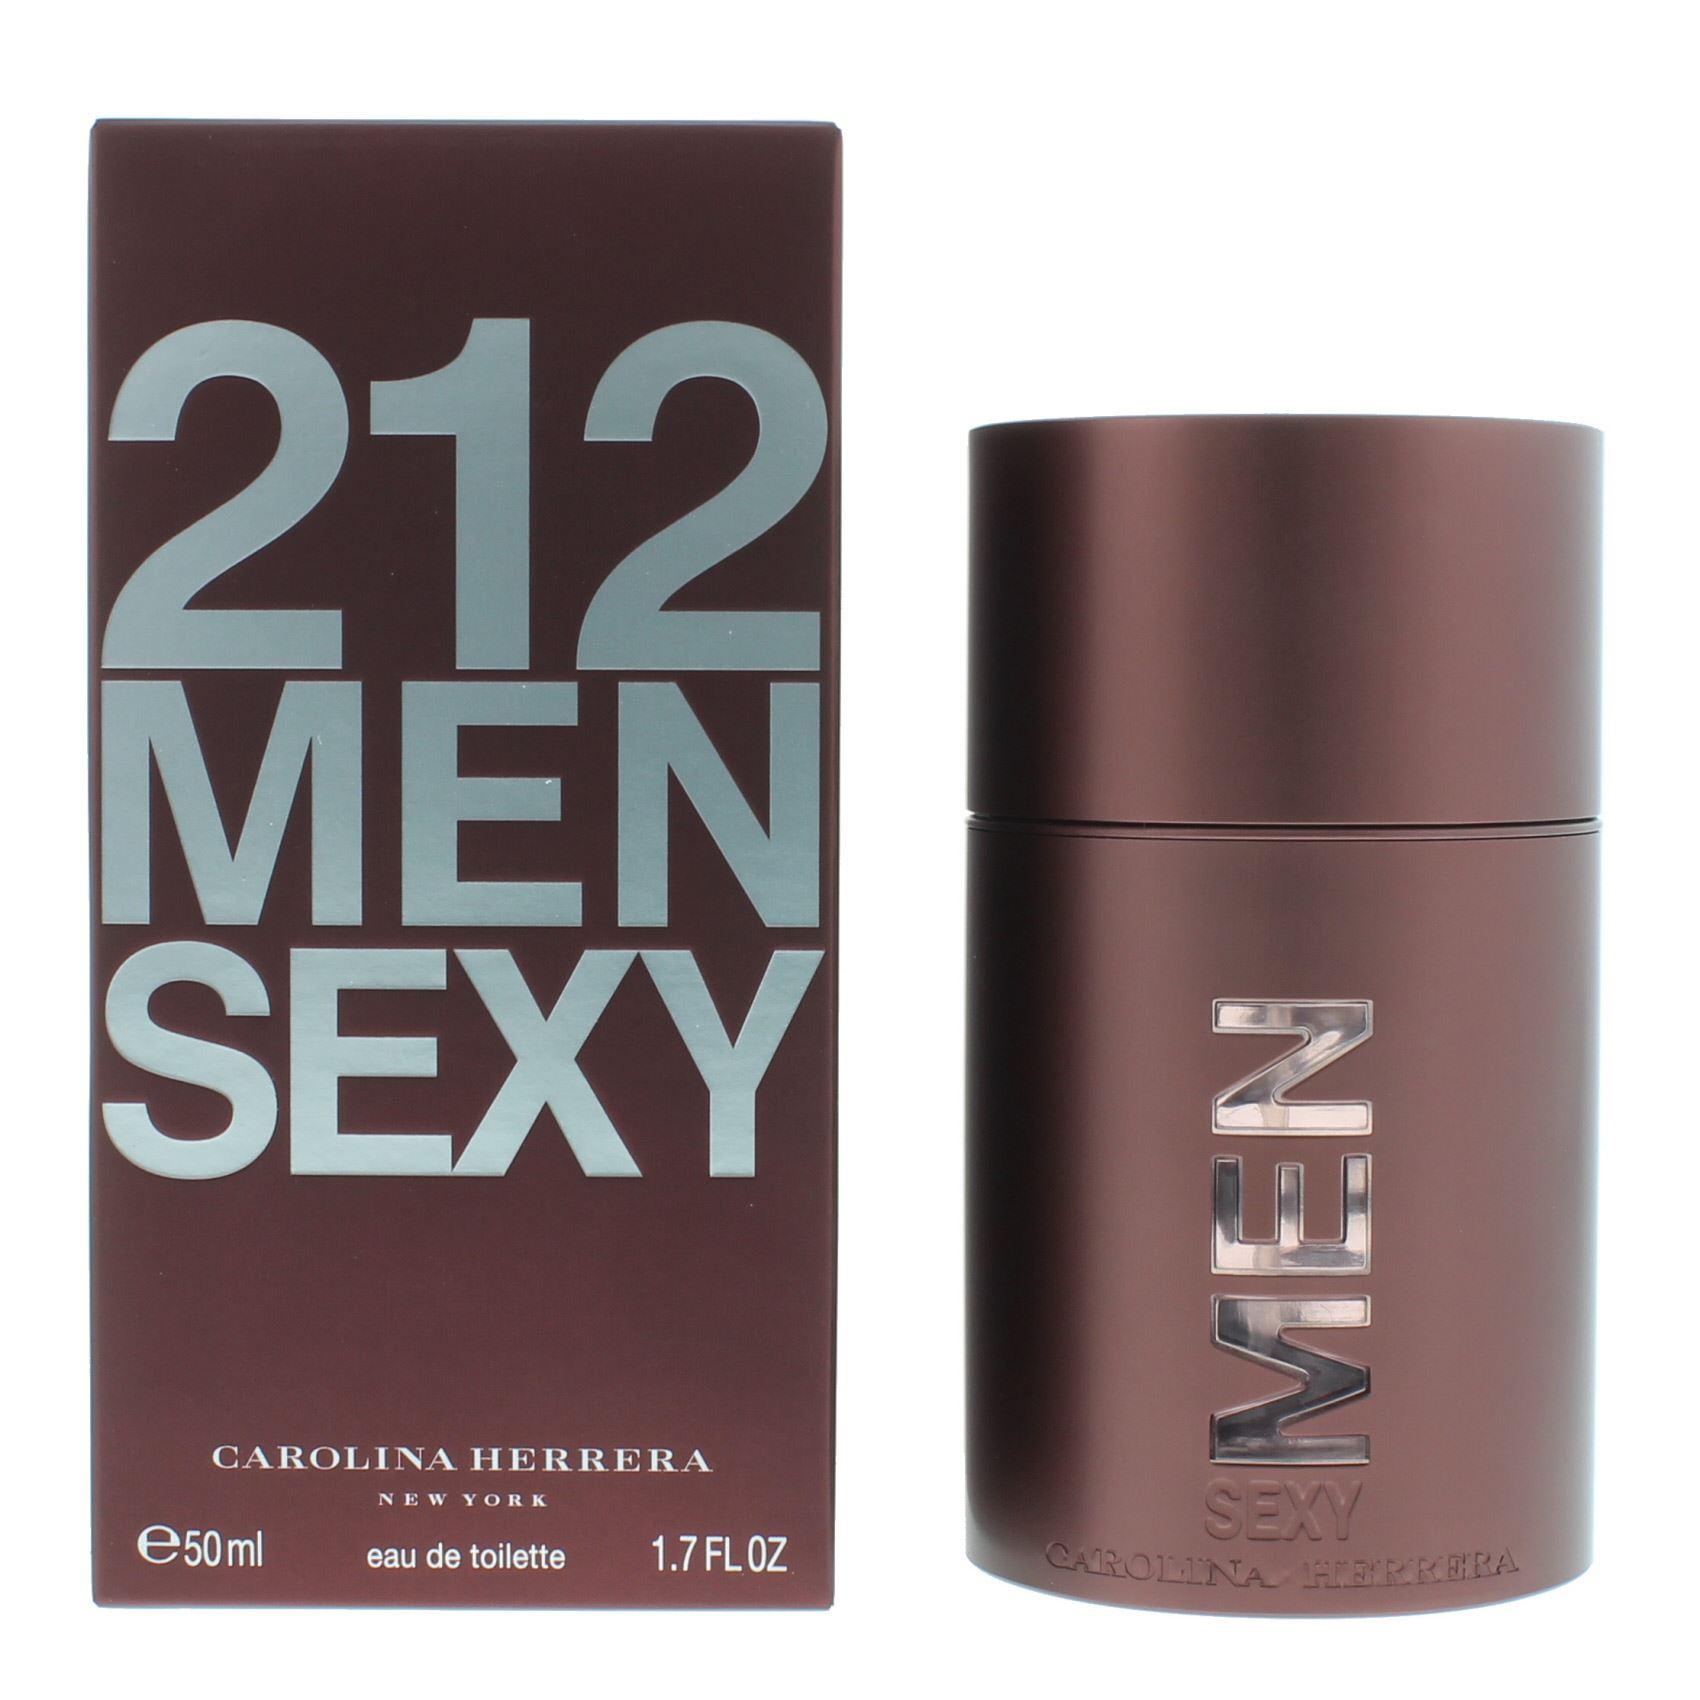 896dab90b2 Details about Carolina Herrera 212 Men Sexy Eau de Toilette 50ml Spray For  Him - NEW. EDT